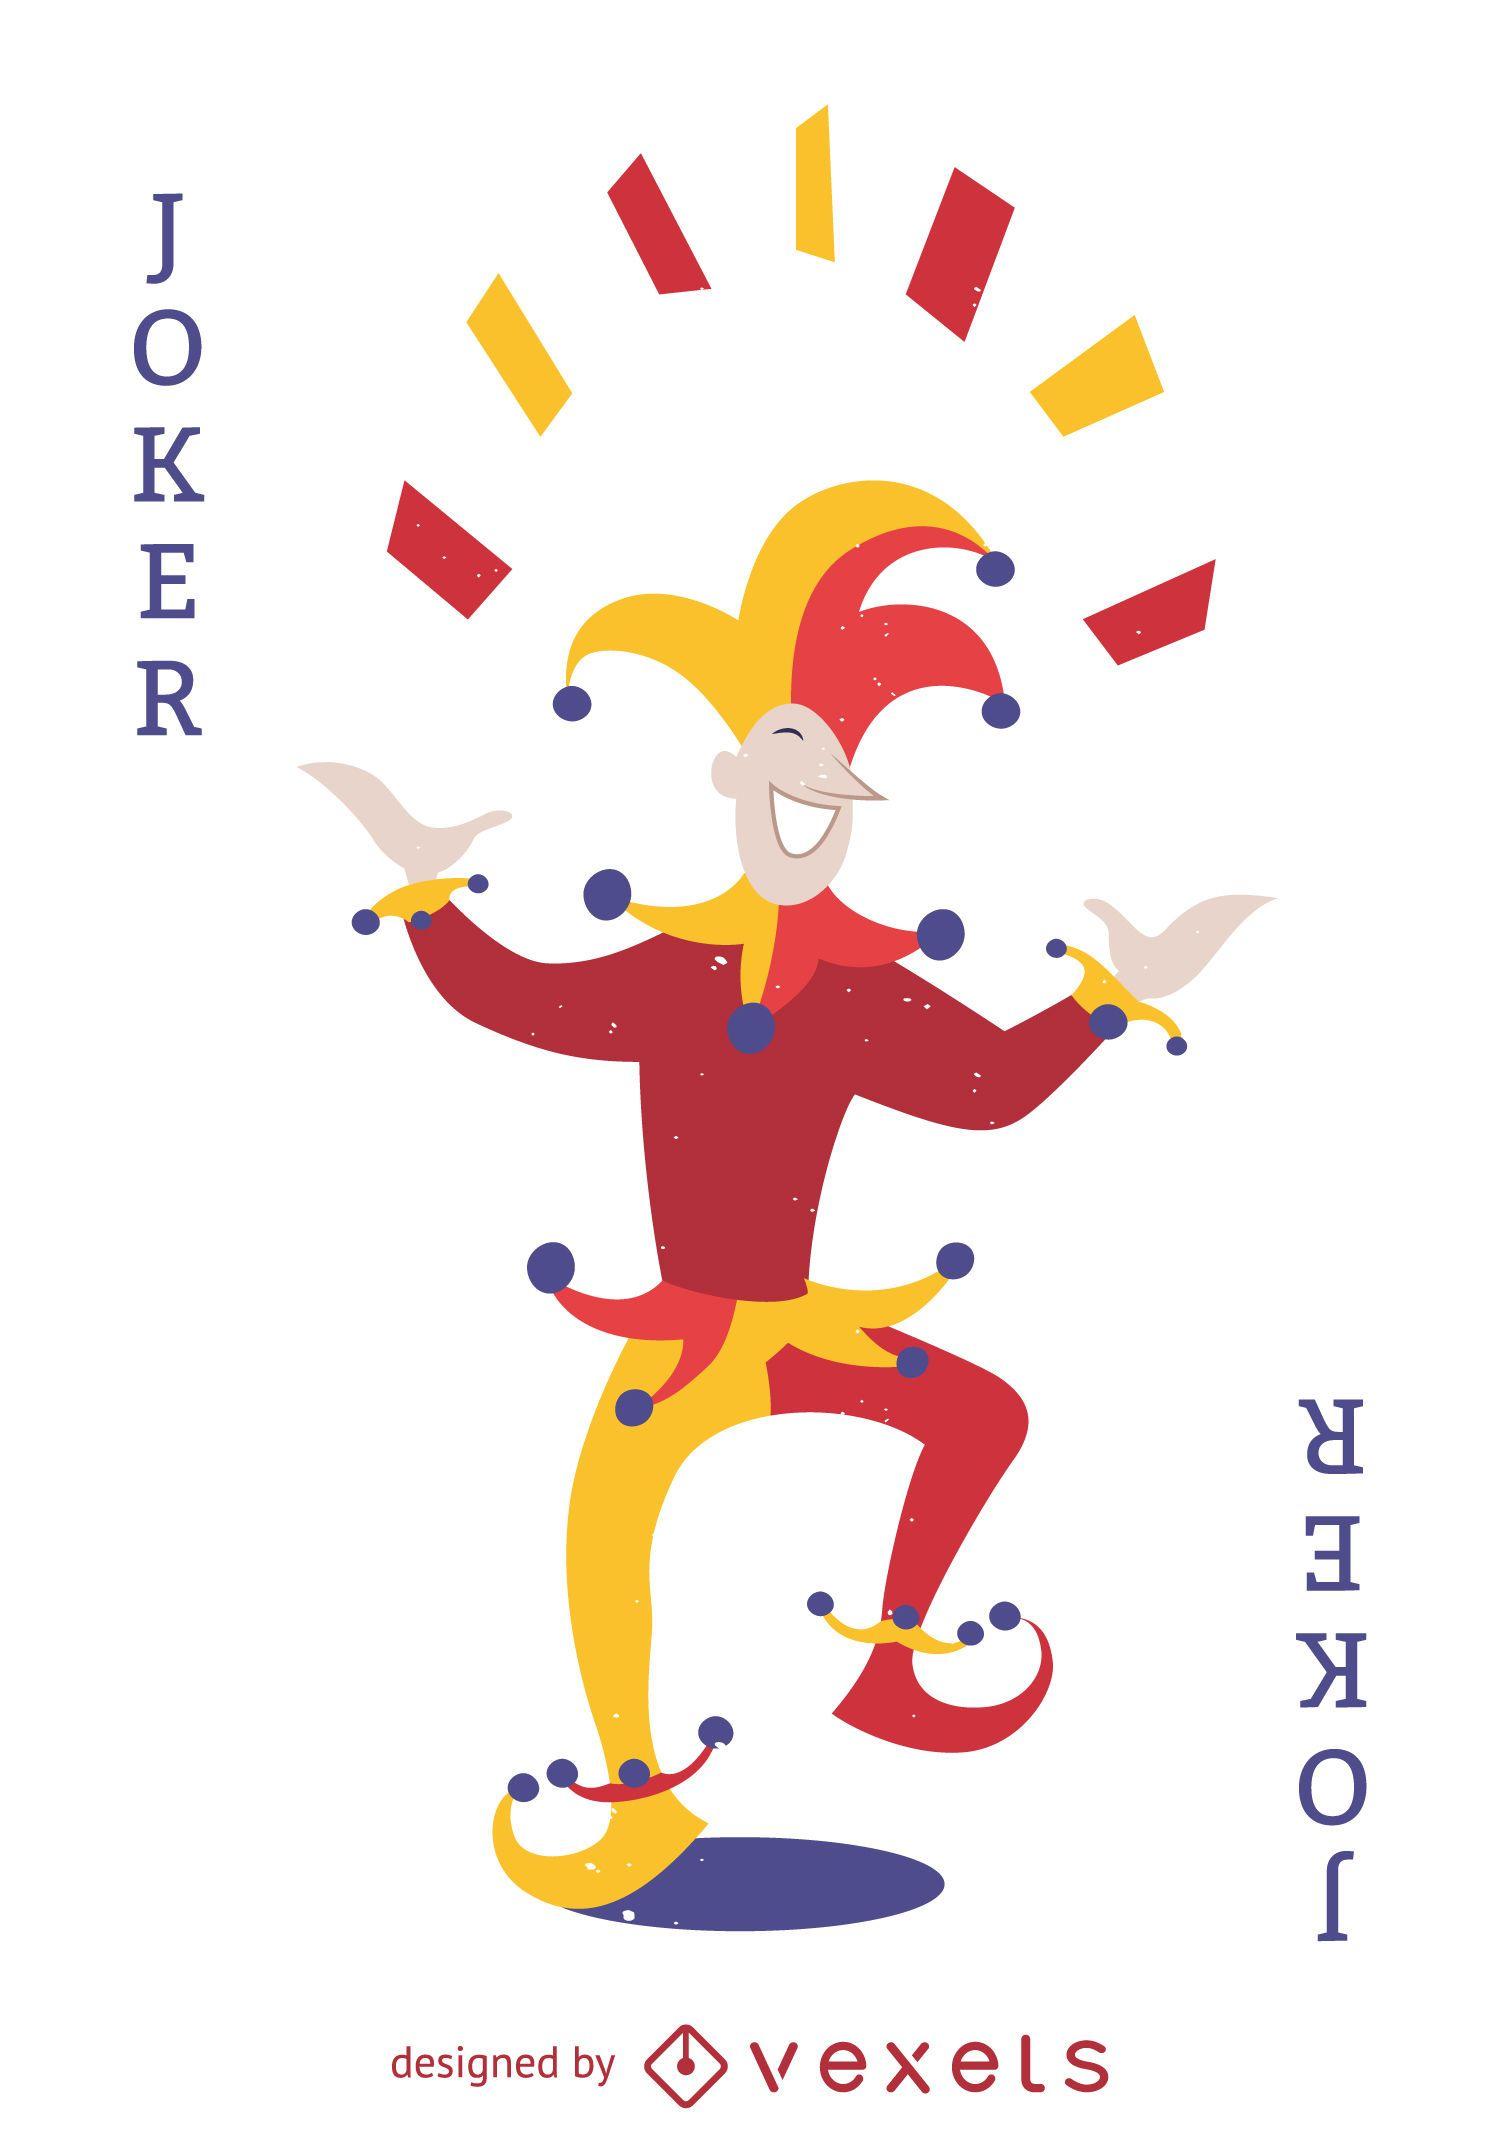 Ilustración de tarjeta de Joker